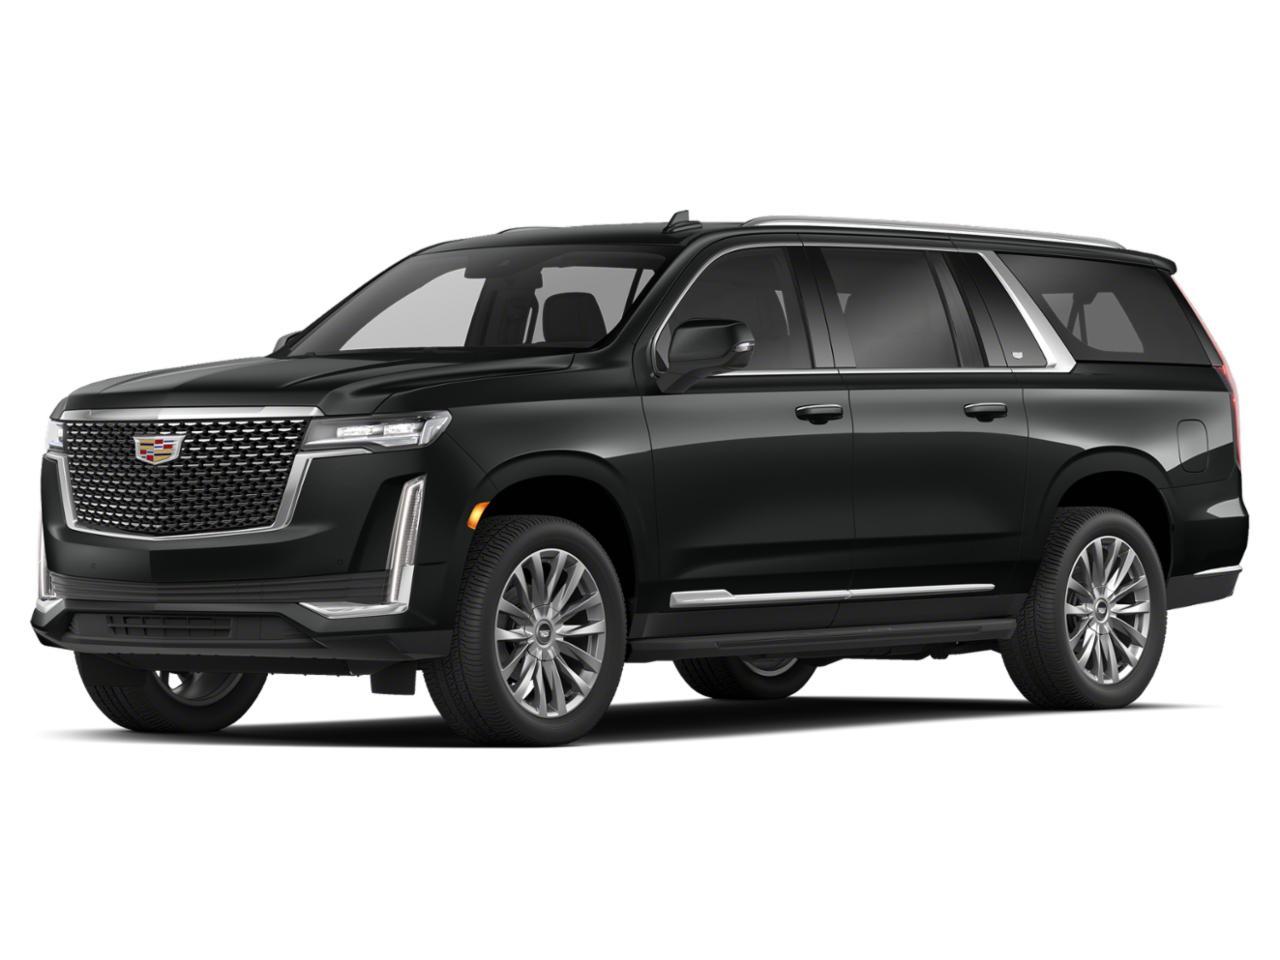 2021 Cadillac Escalade ESV Vehicle Photo in Grapevine, TX 76051